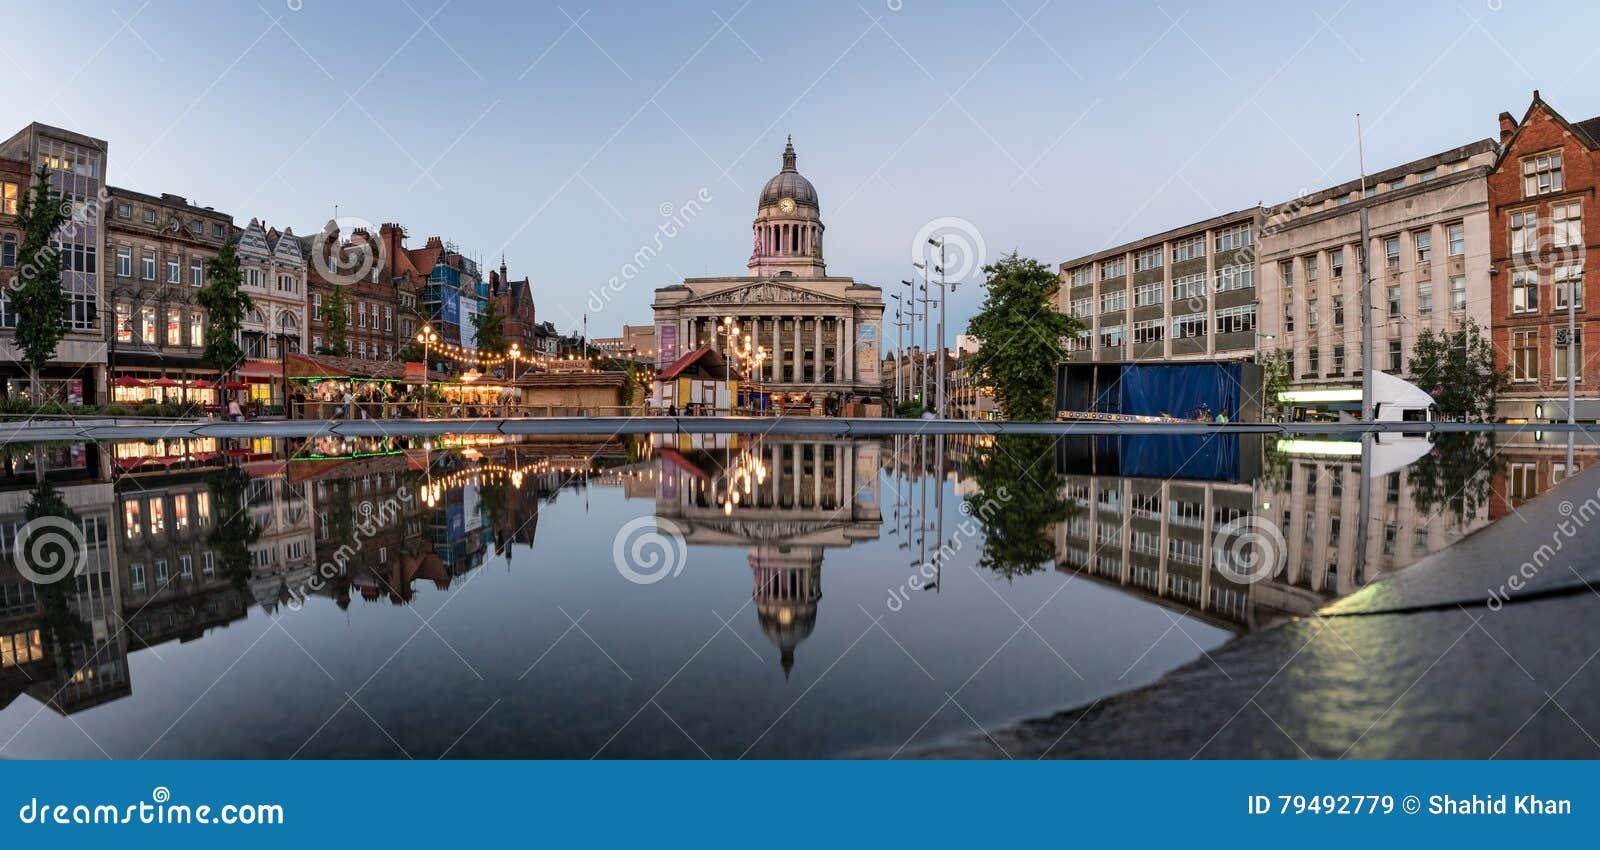 The Council House , Old Market Square, Nottingham, England, UK